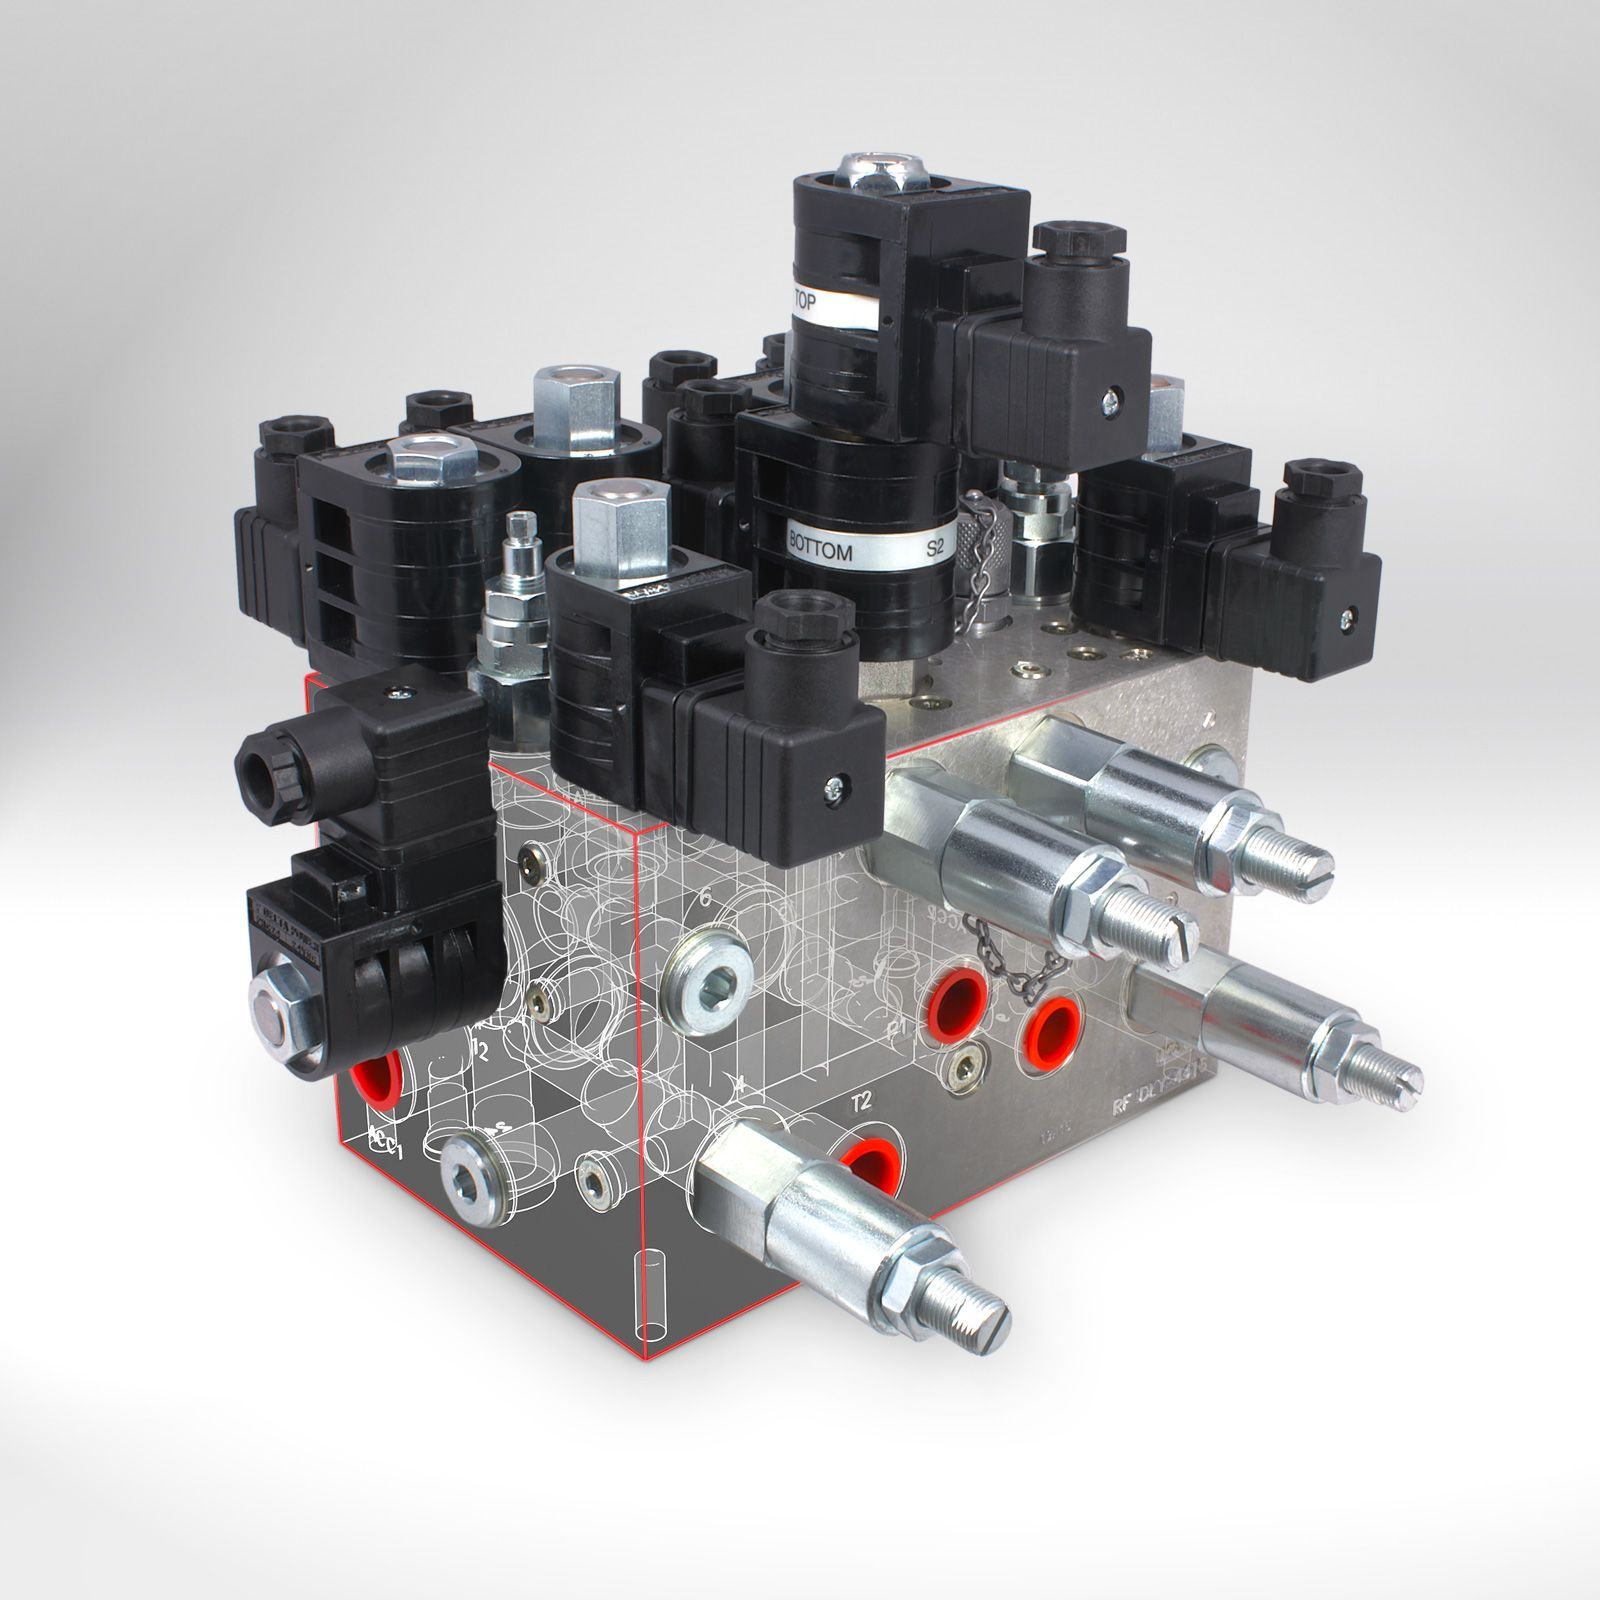 Hydraulic Manifold Control Assembly